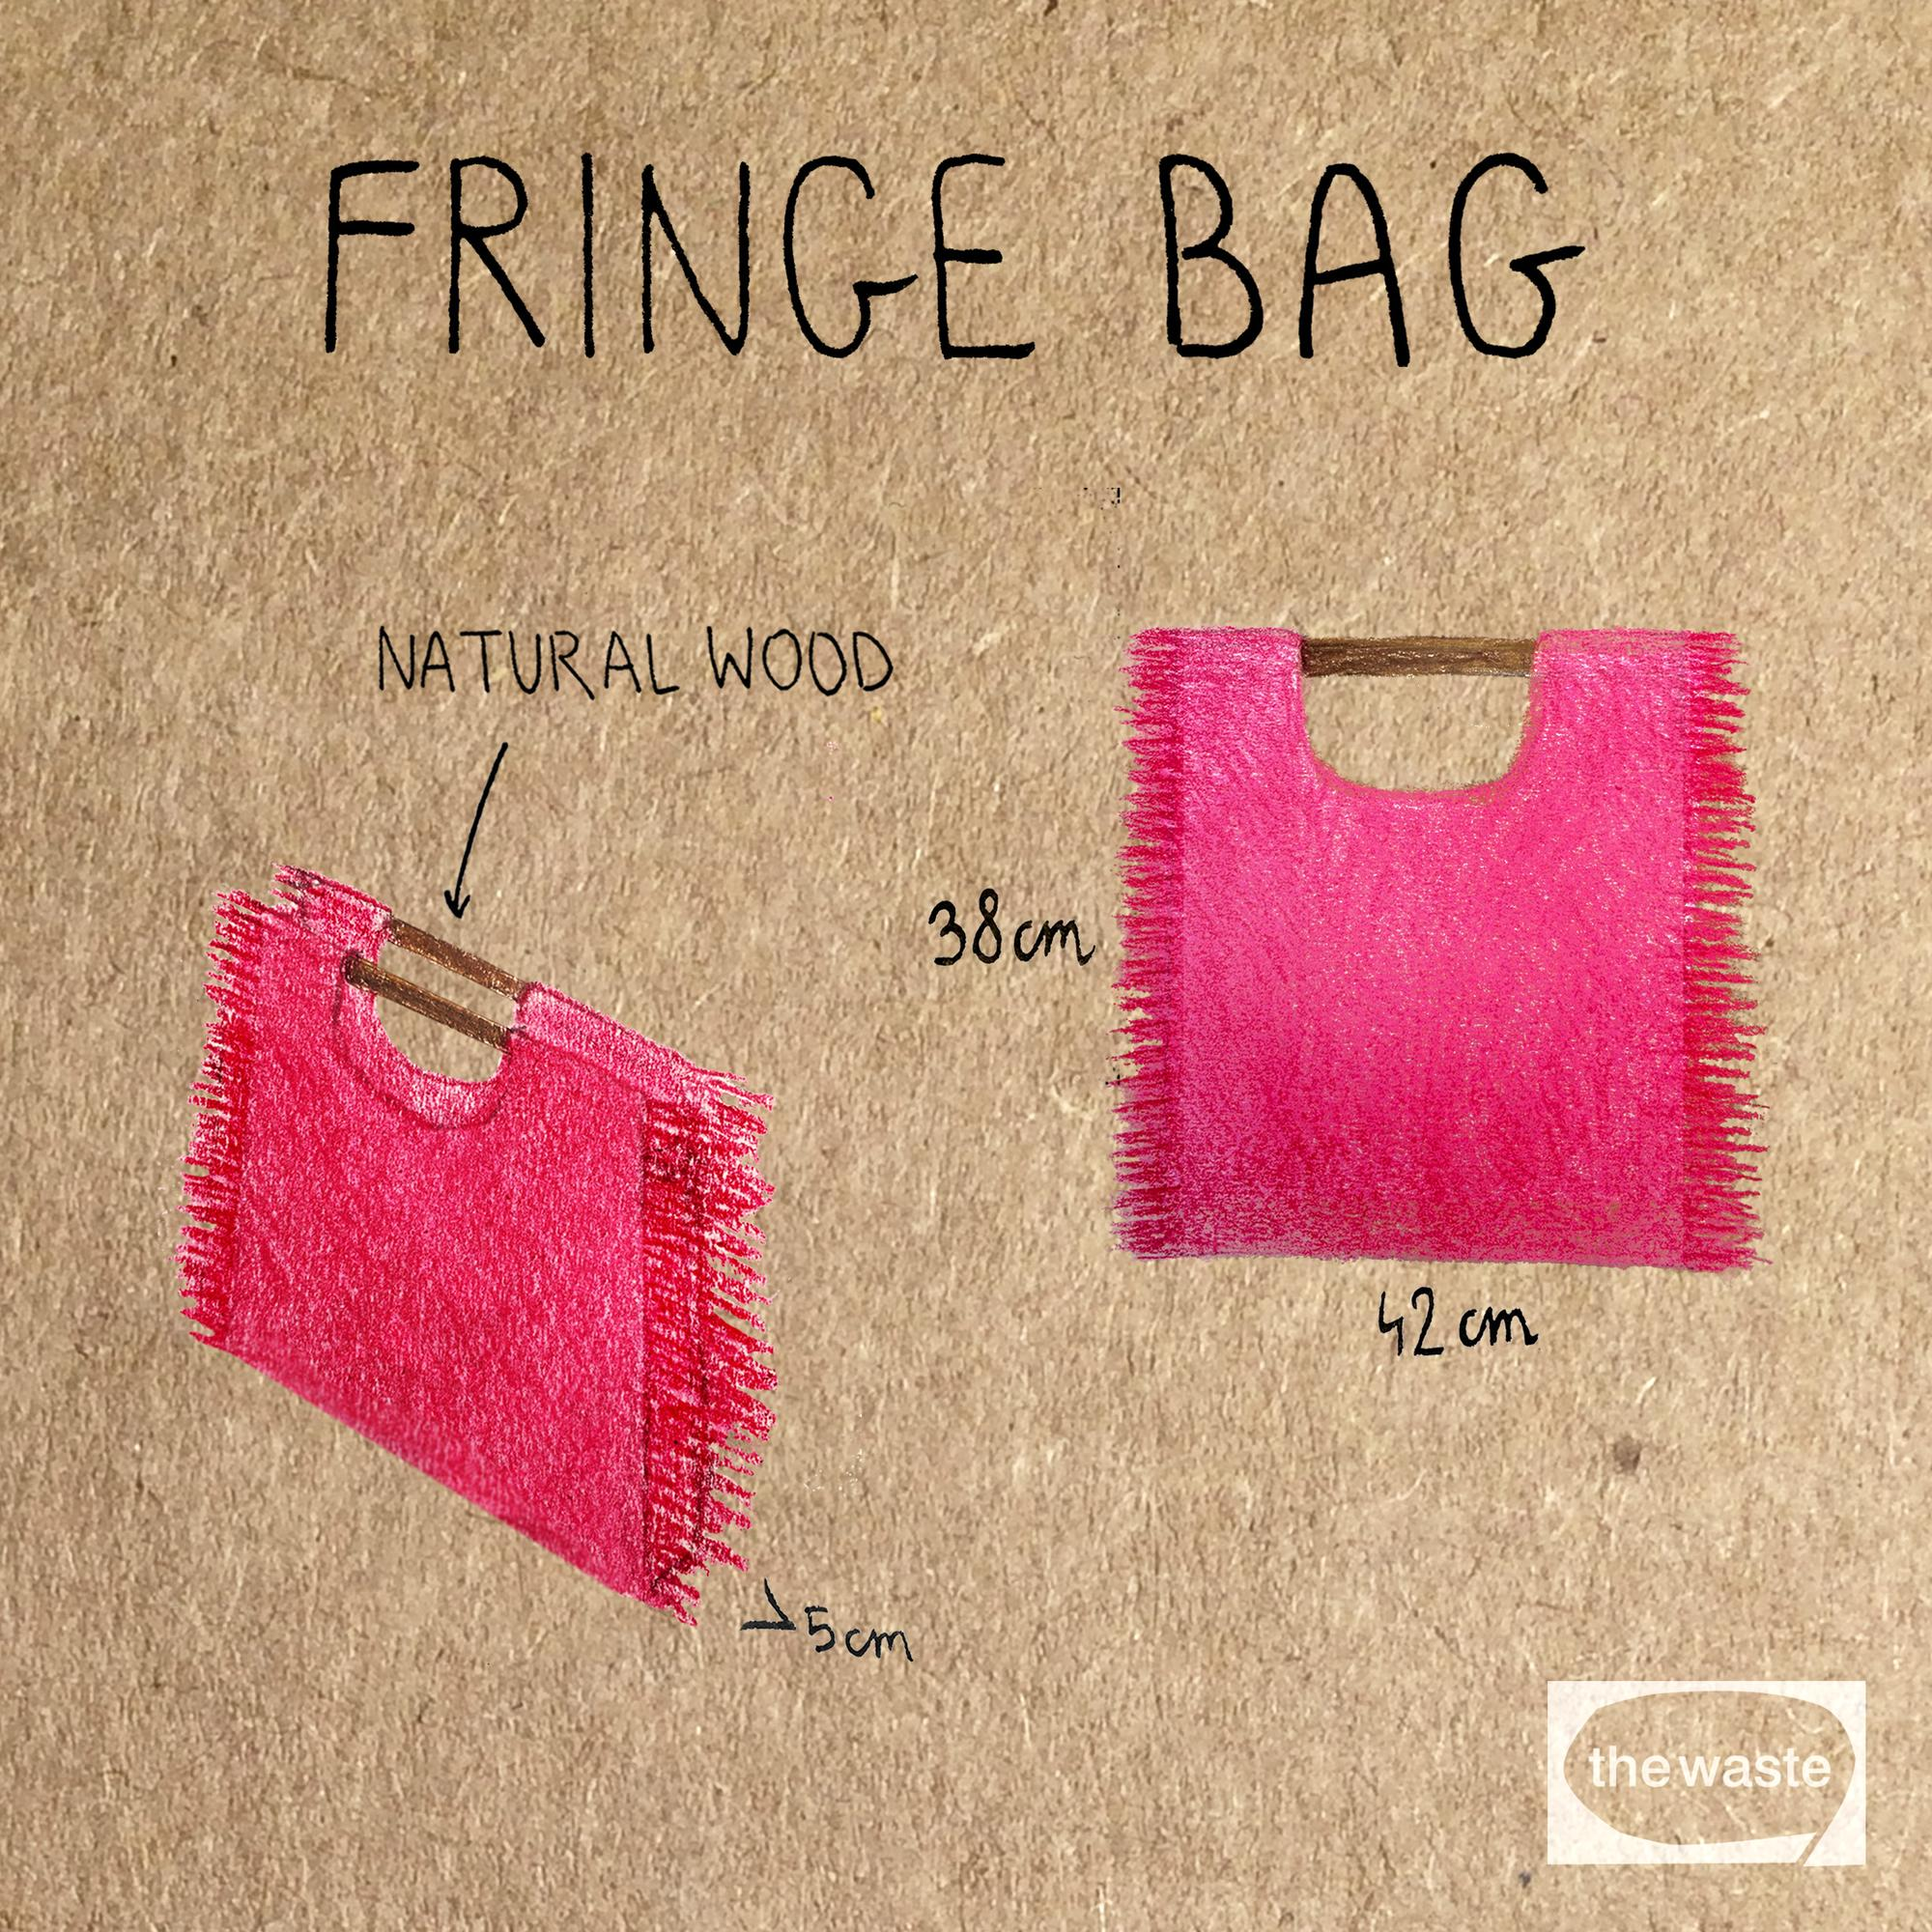 THE FRINGE BAG - light blue torba letnia miejska niebieska polski projektant- The Waste